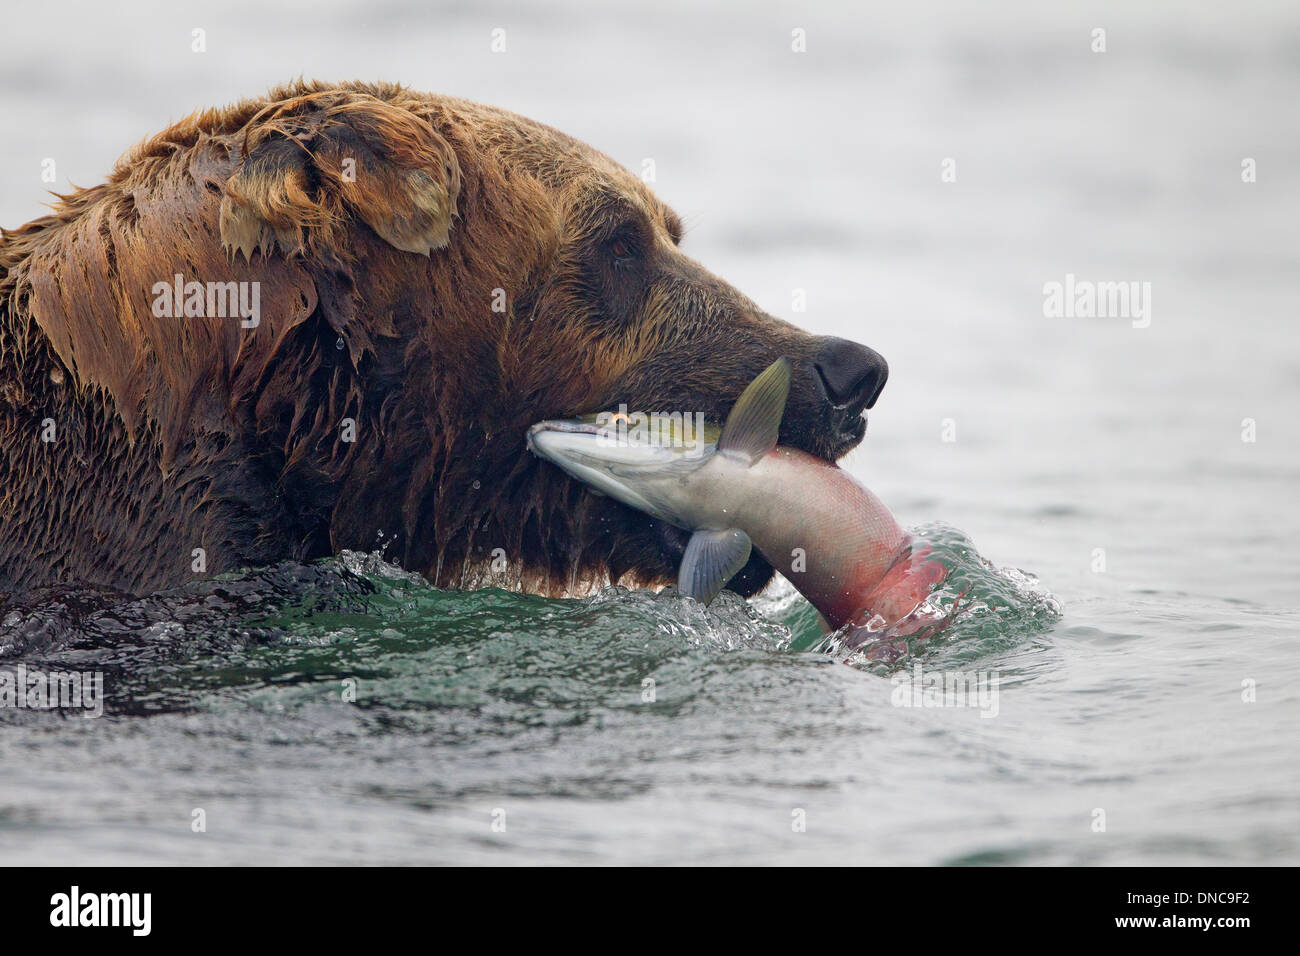 Alaskan Brown Bear Catching Salmon - Stock Image